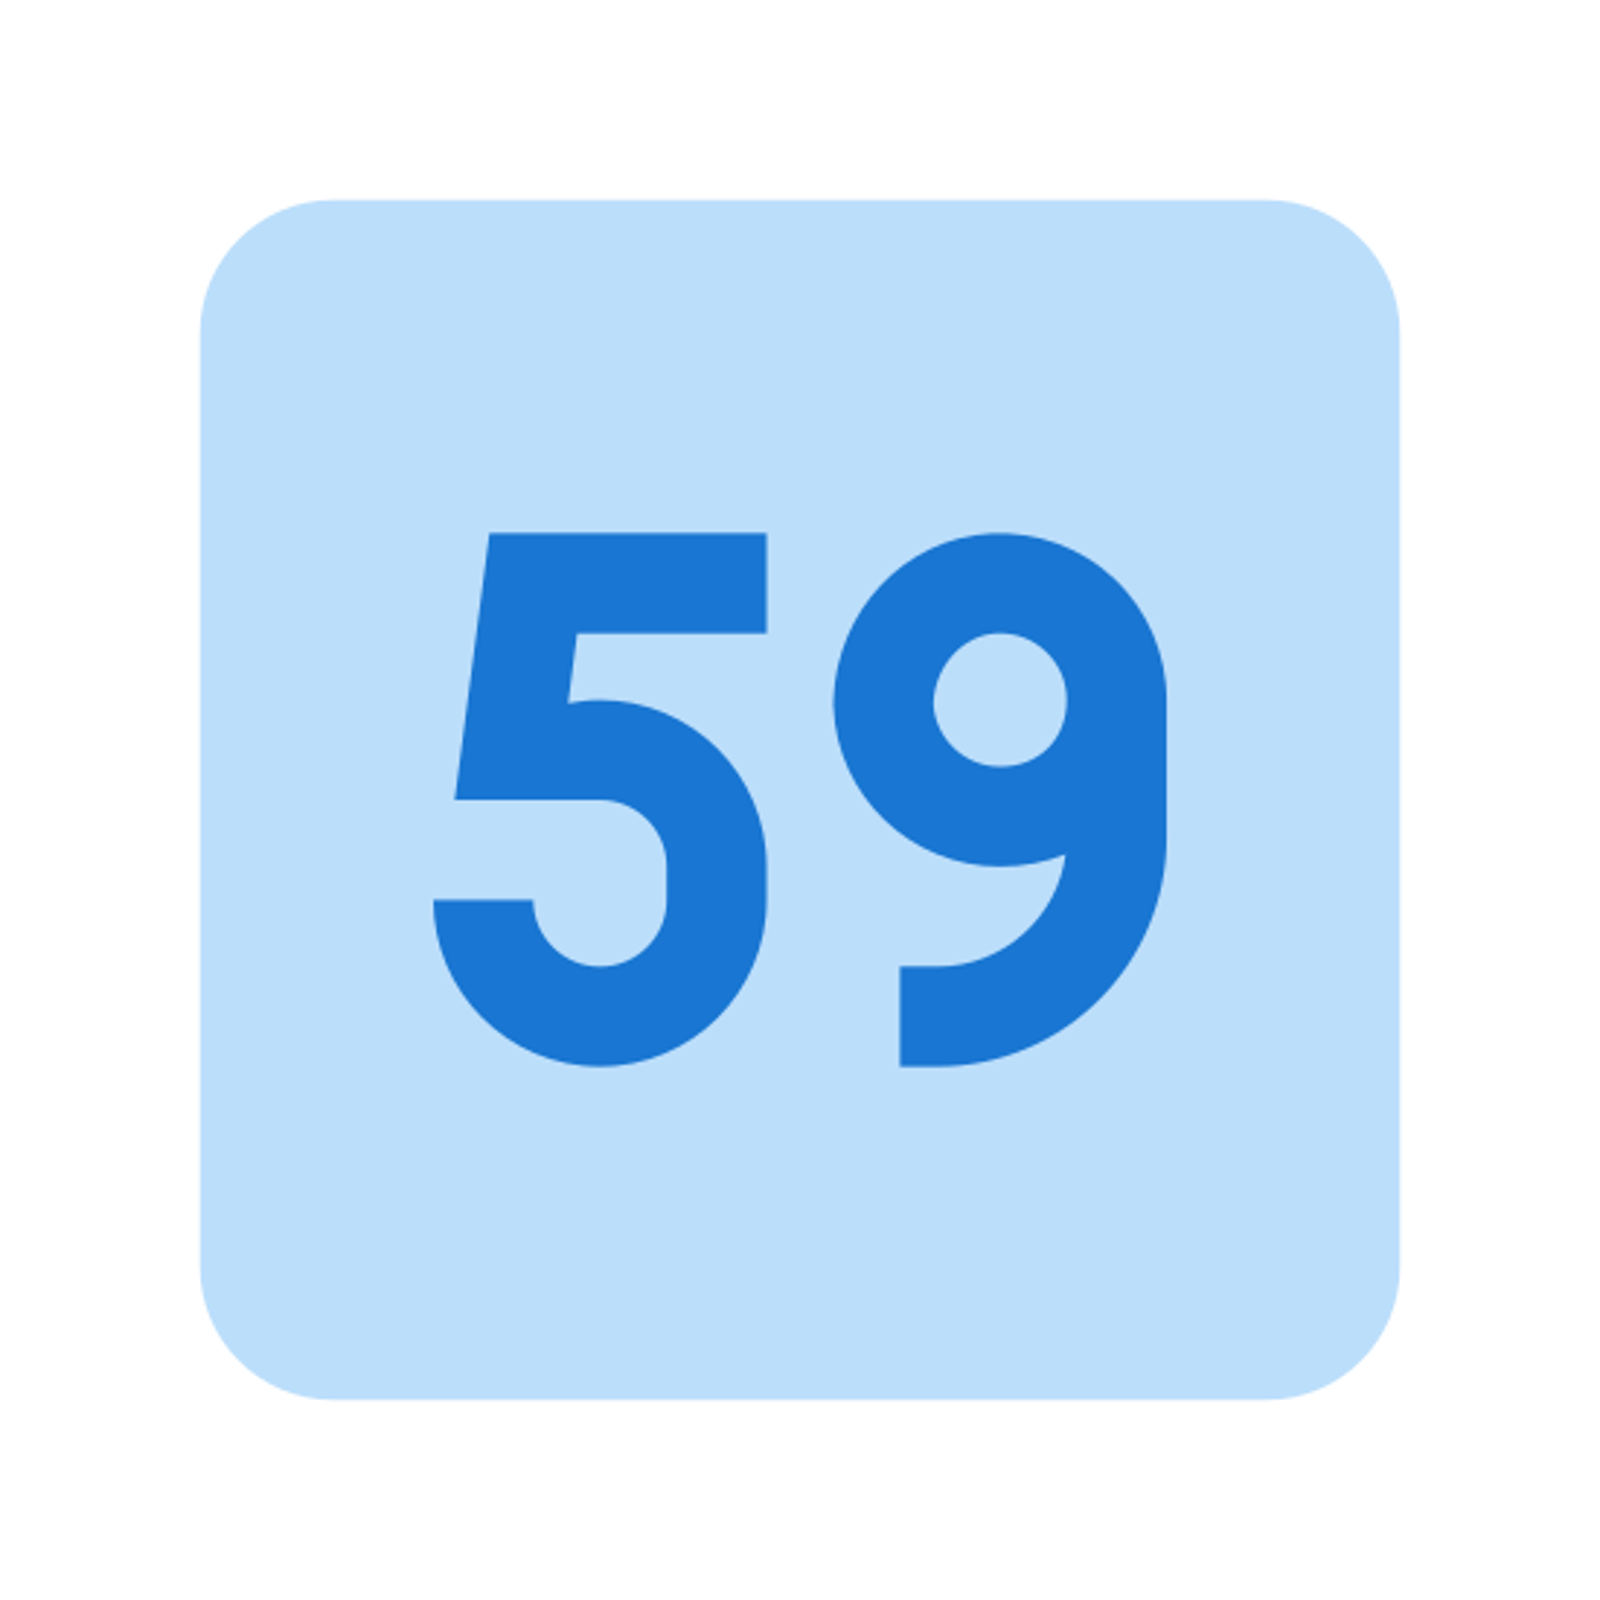 59 icon